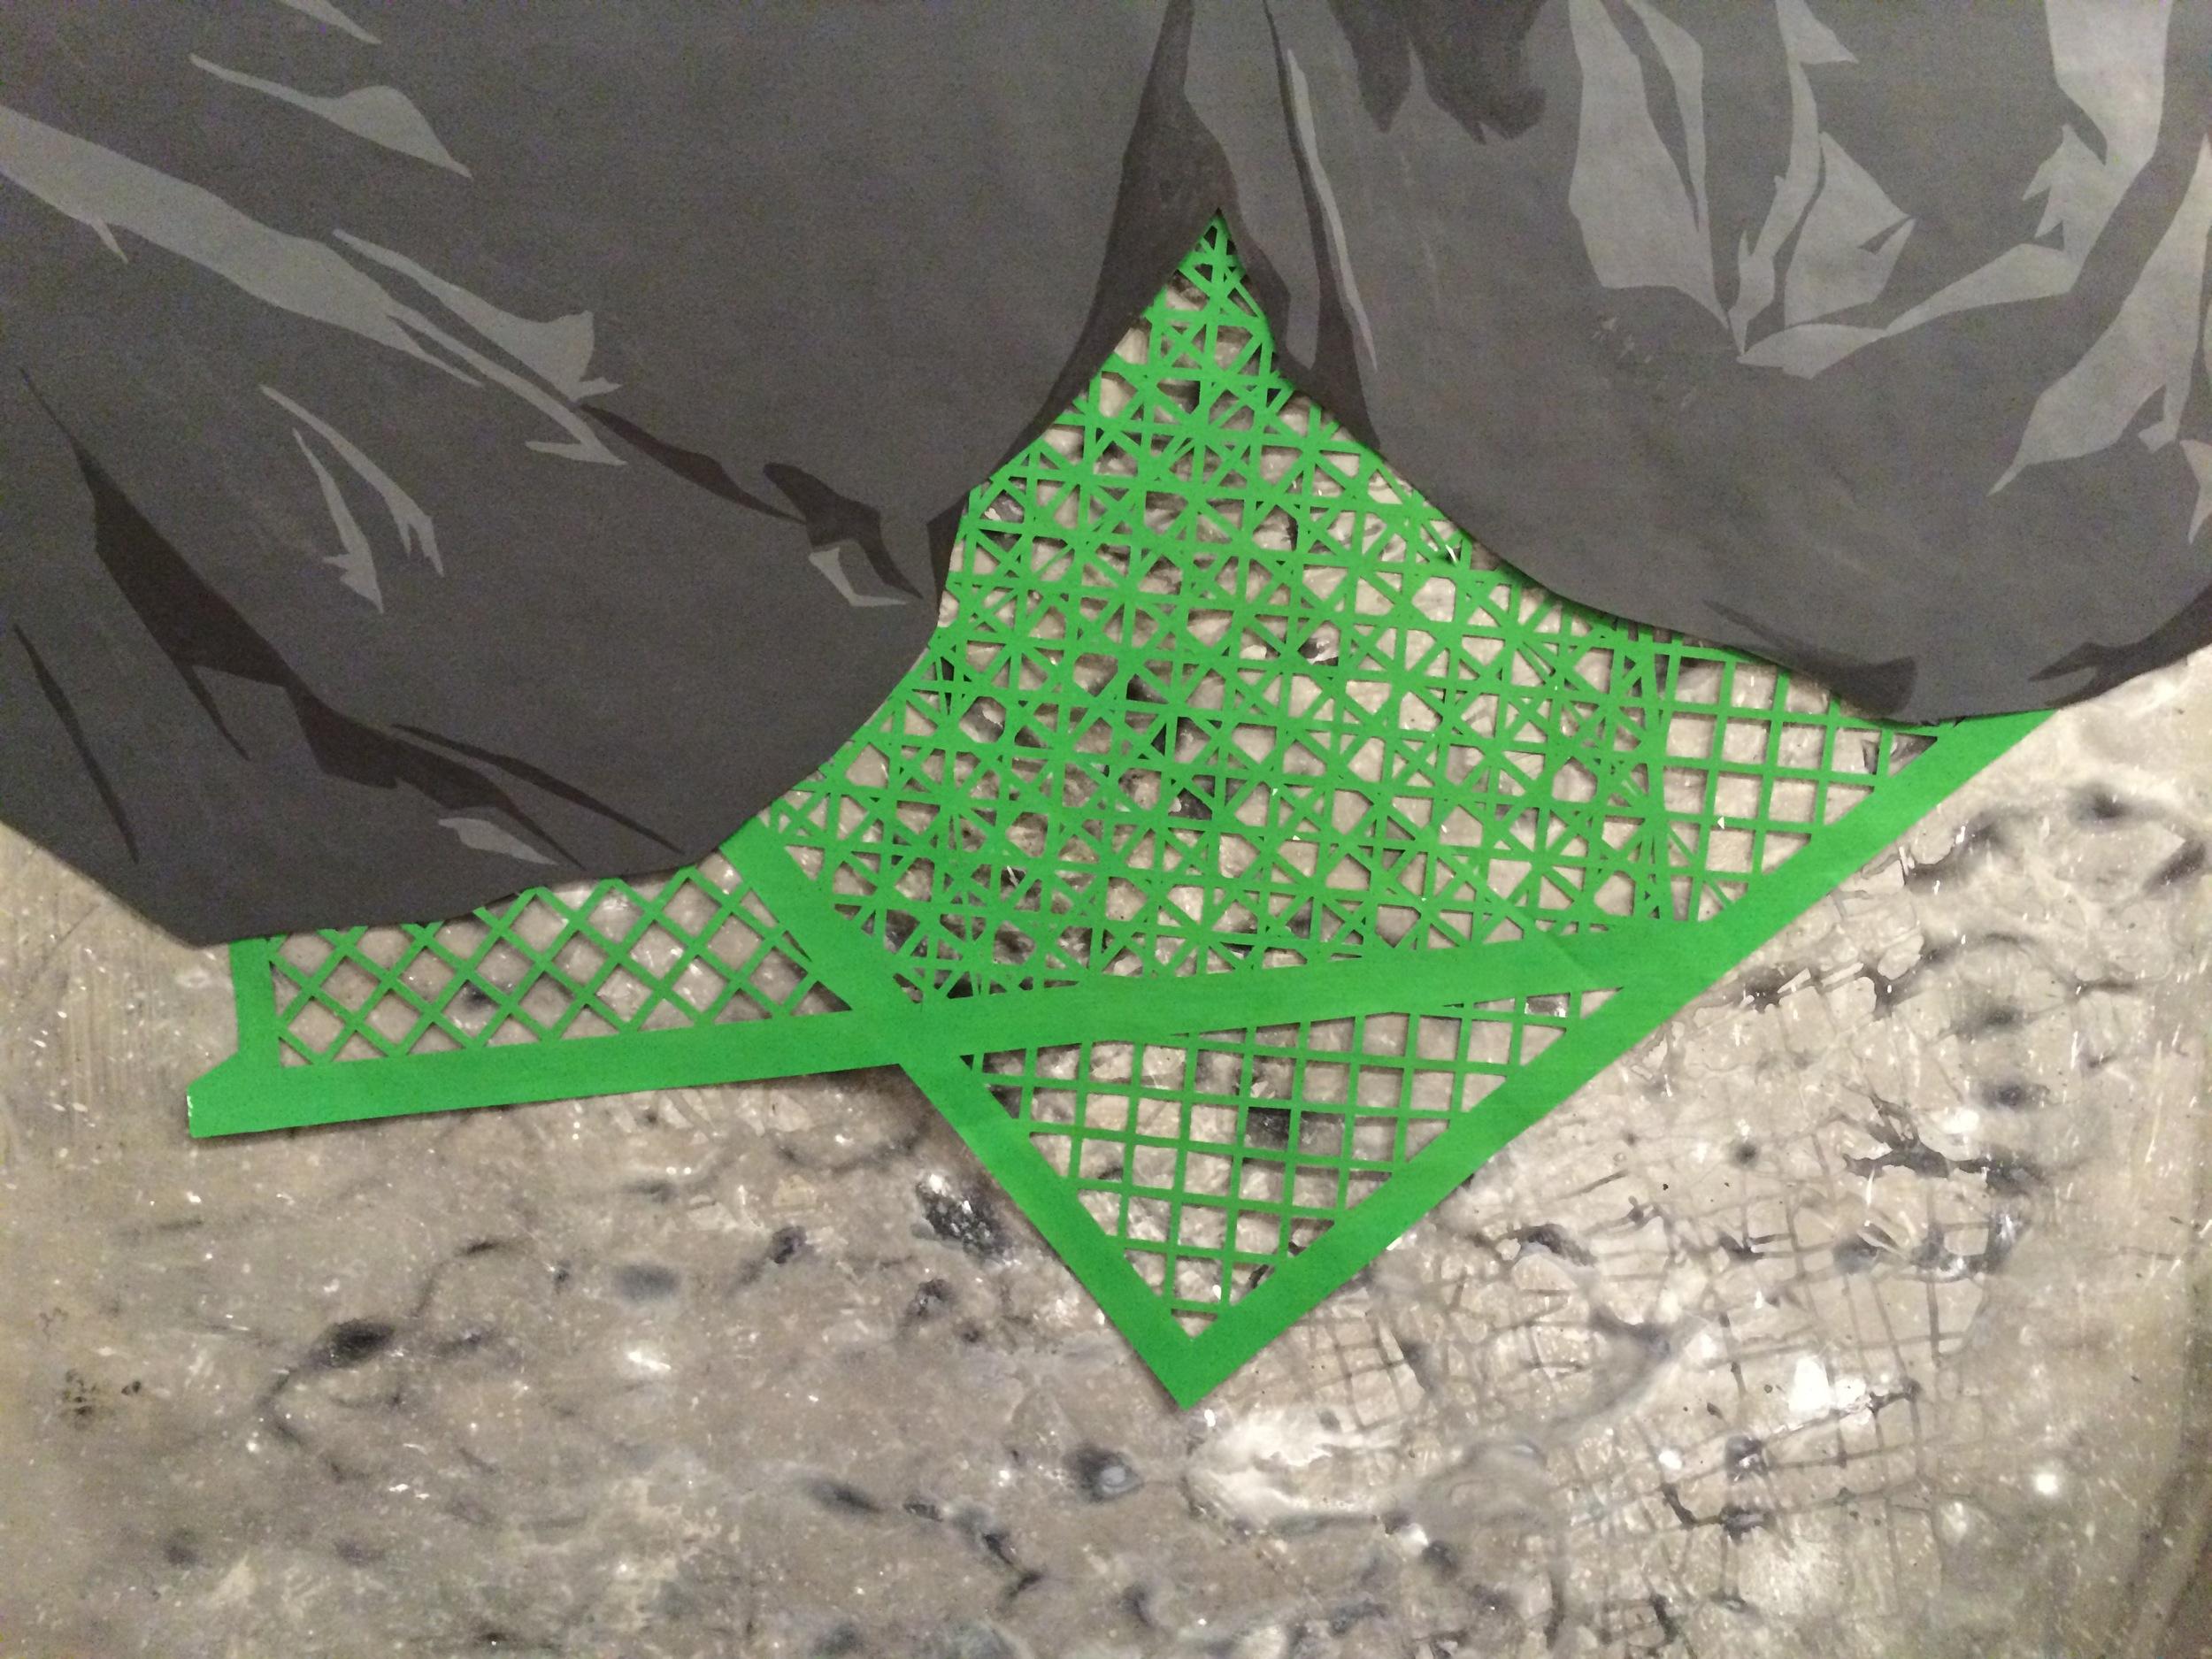 "Green Crates, acrylic on layered Tyvek, 40"" x 60,"" 2015"